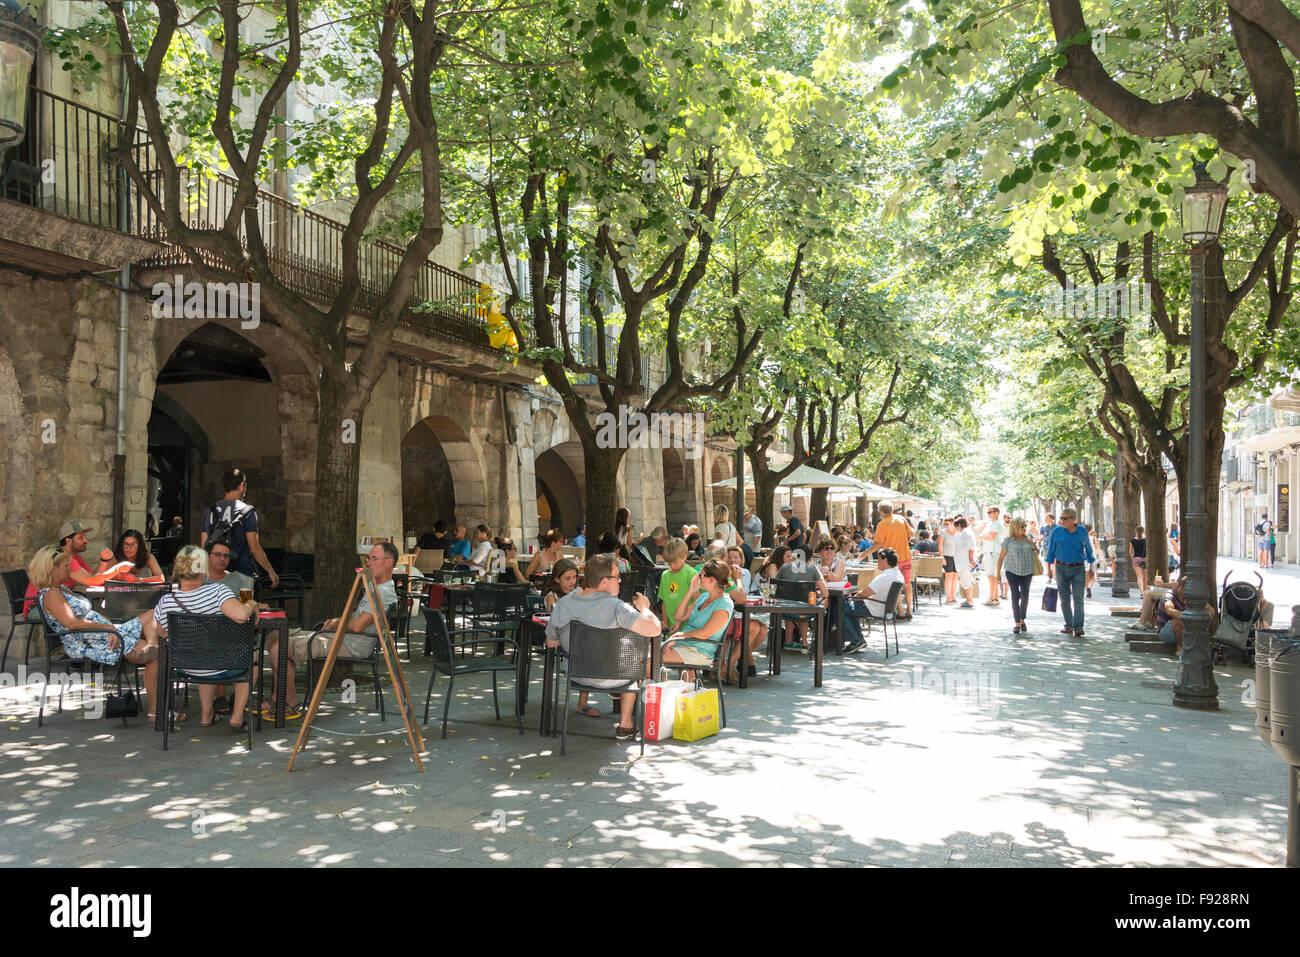 La Rambla De La Llibertat, Old Town, Girona (Gerona), Provinz Girona, Katalonien, Spanien Stockbild